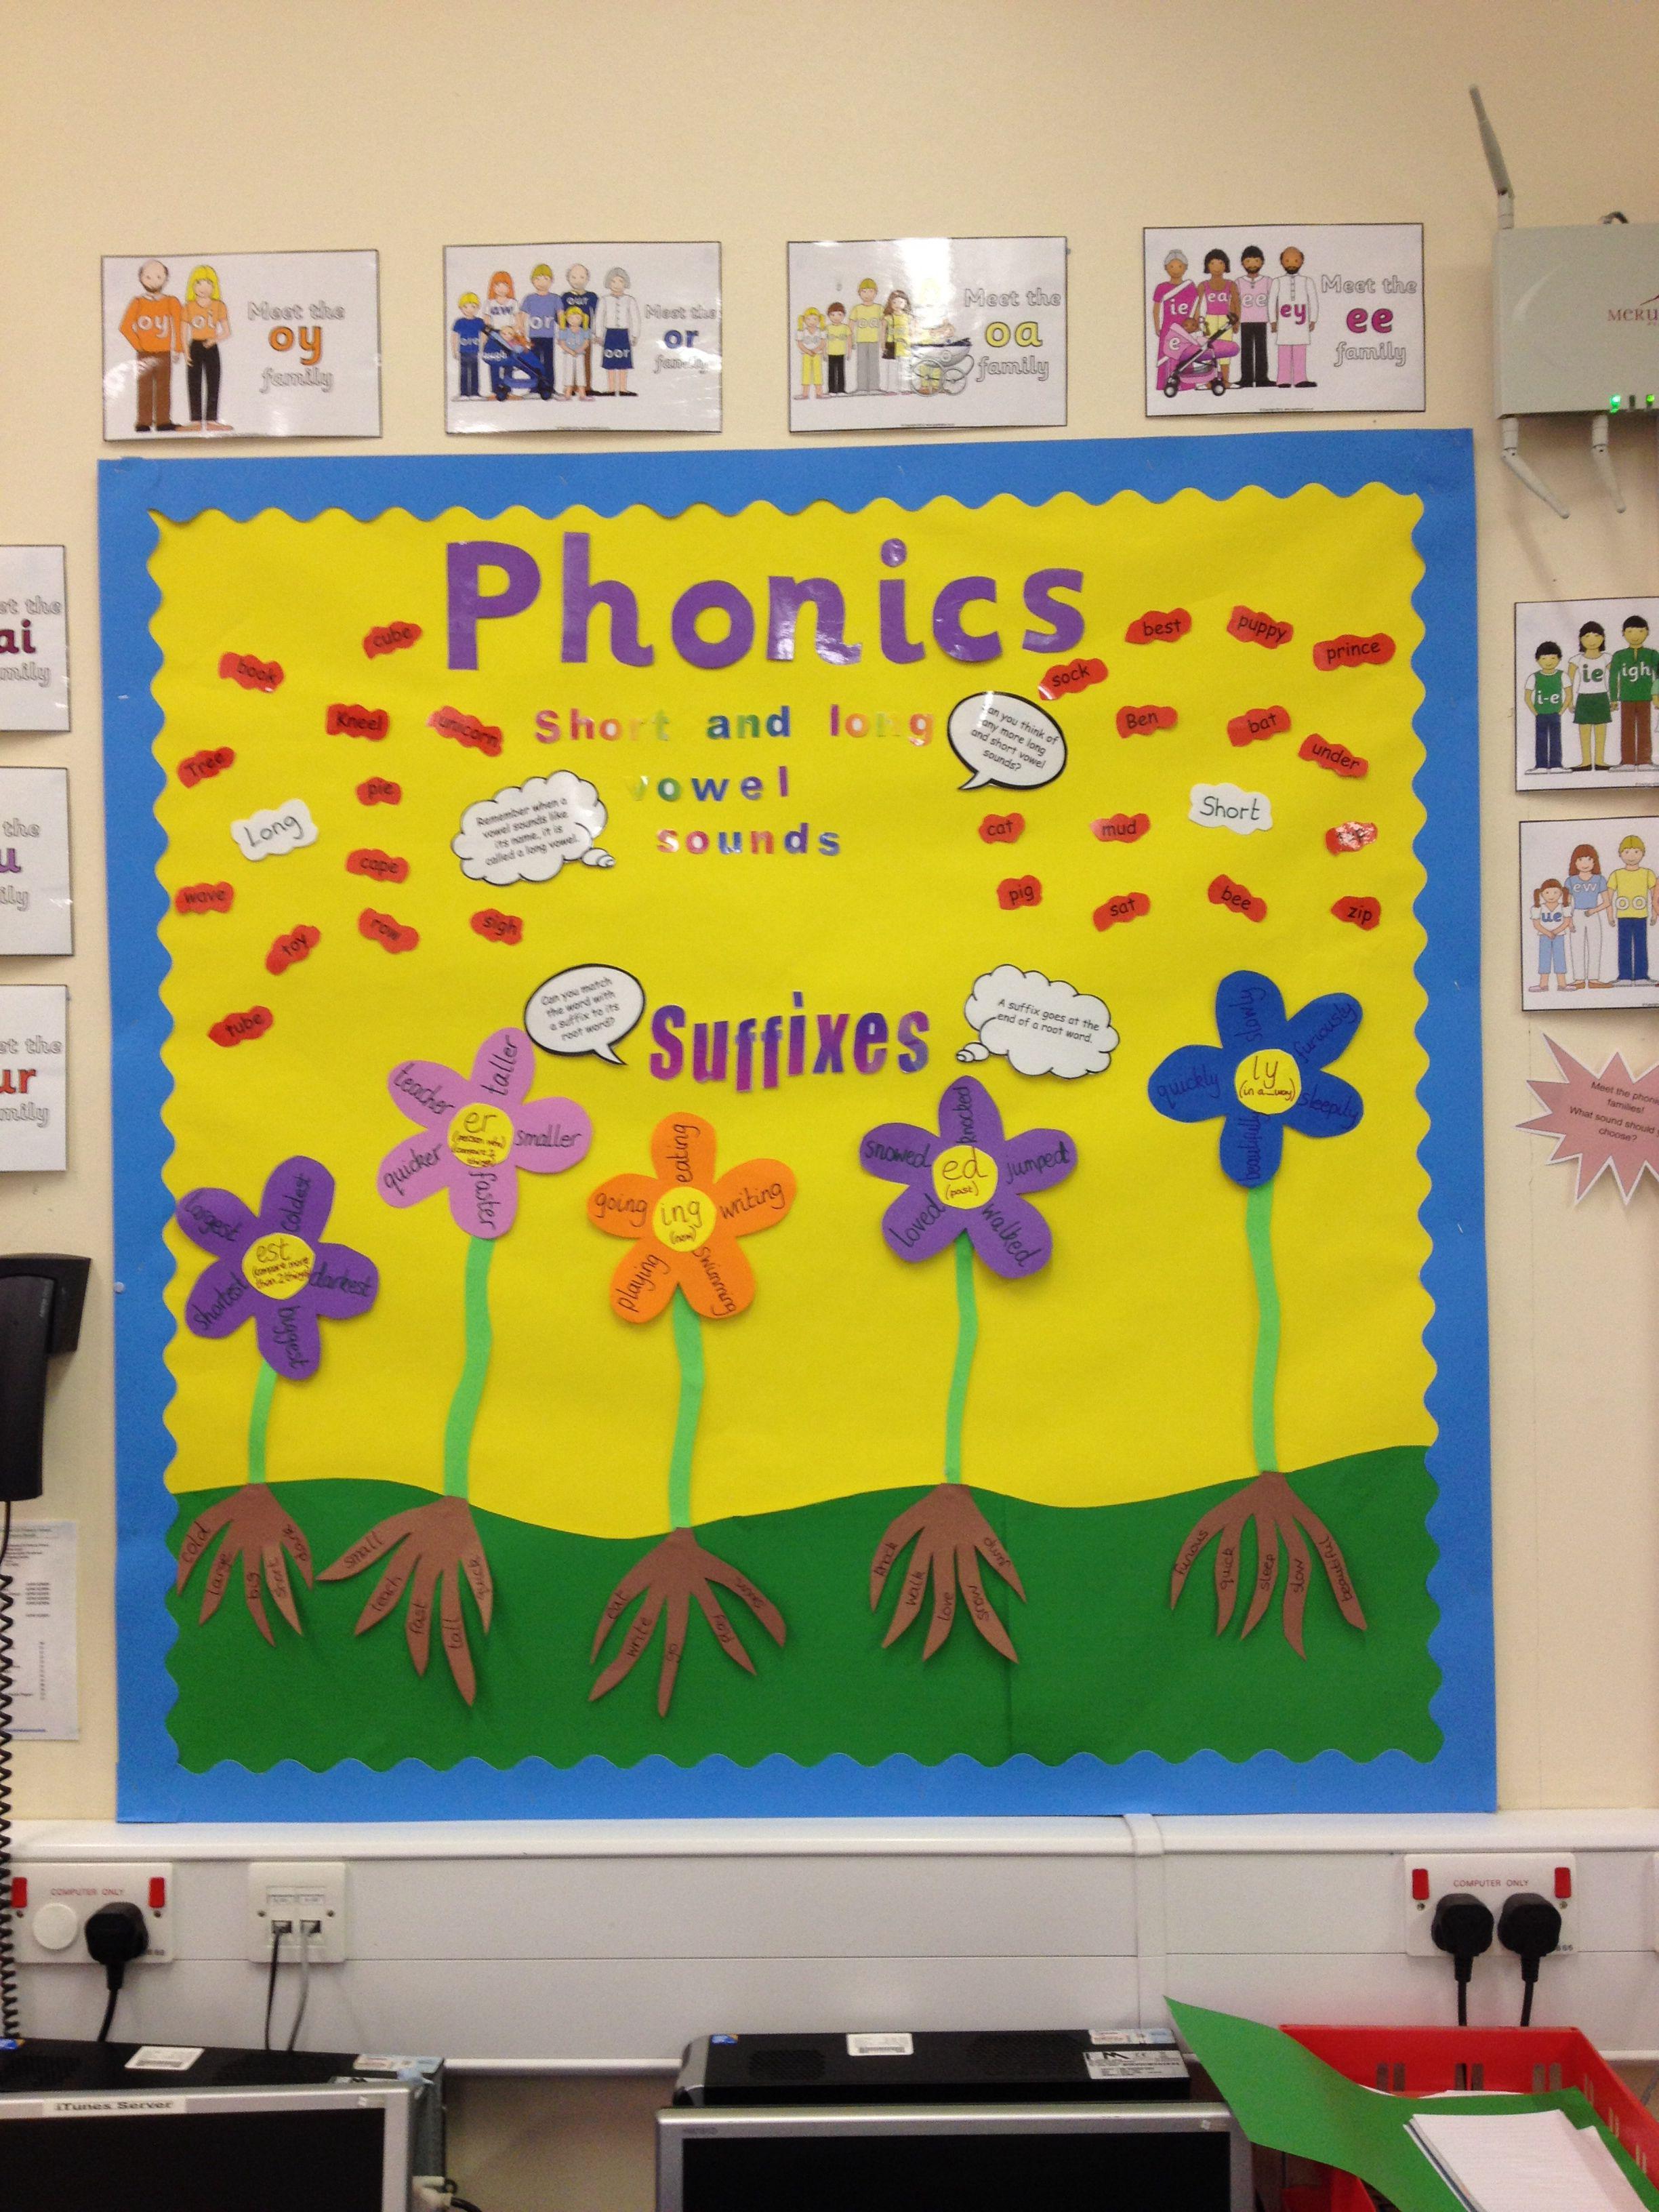 Phonics Phase 6 Suffixes And Prefixes Ks1